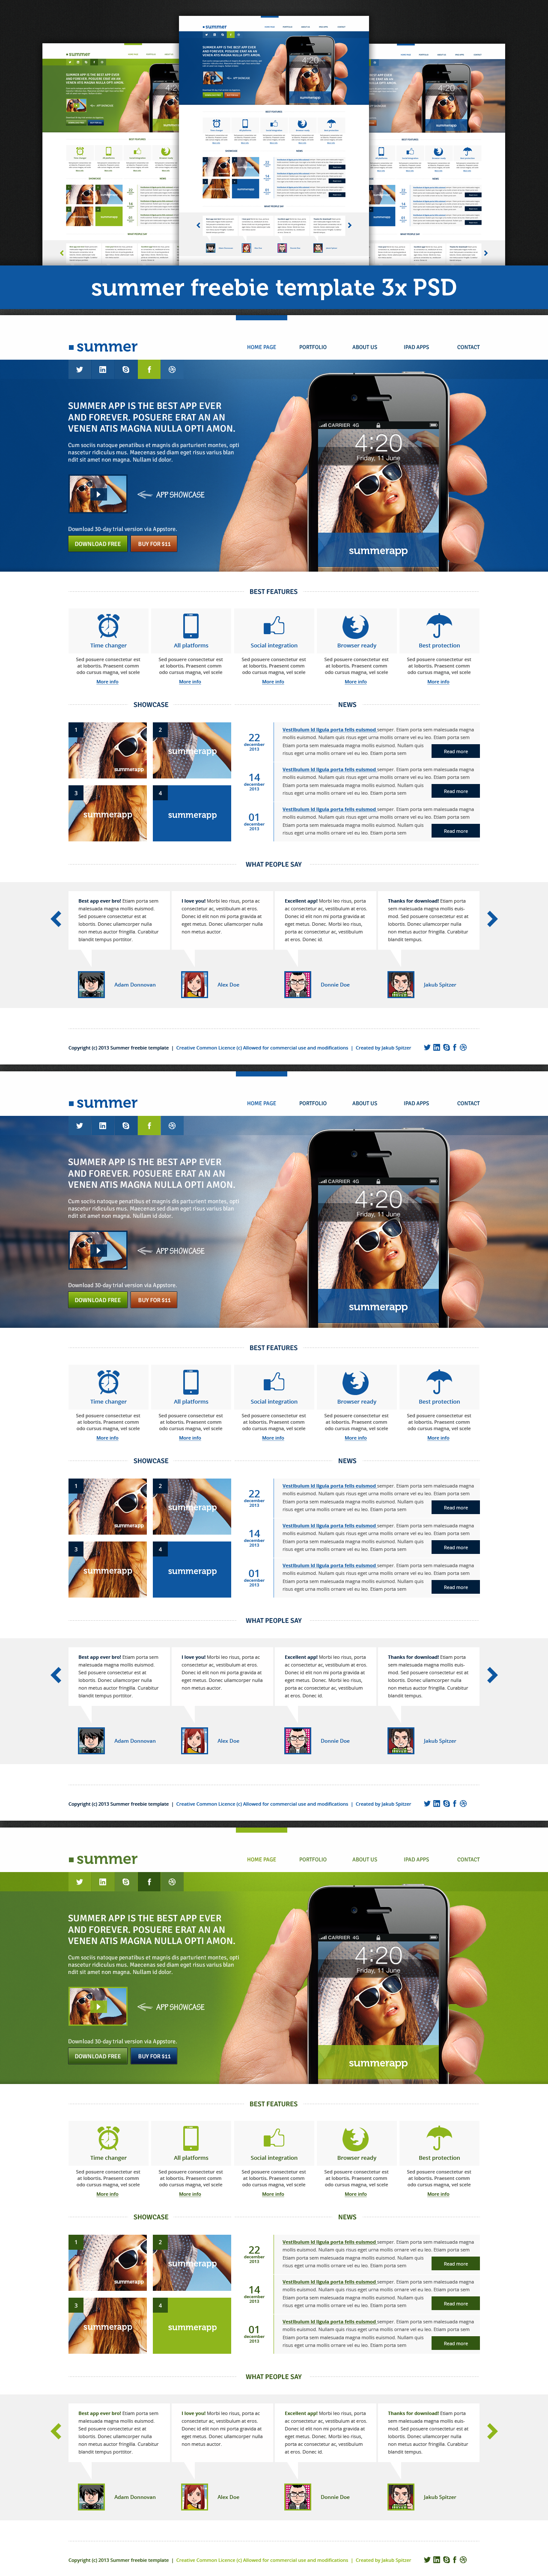 Summer website template (3x free .PSD files) | Free PSD Templates ...